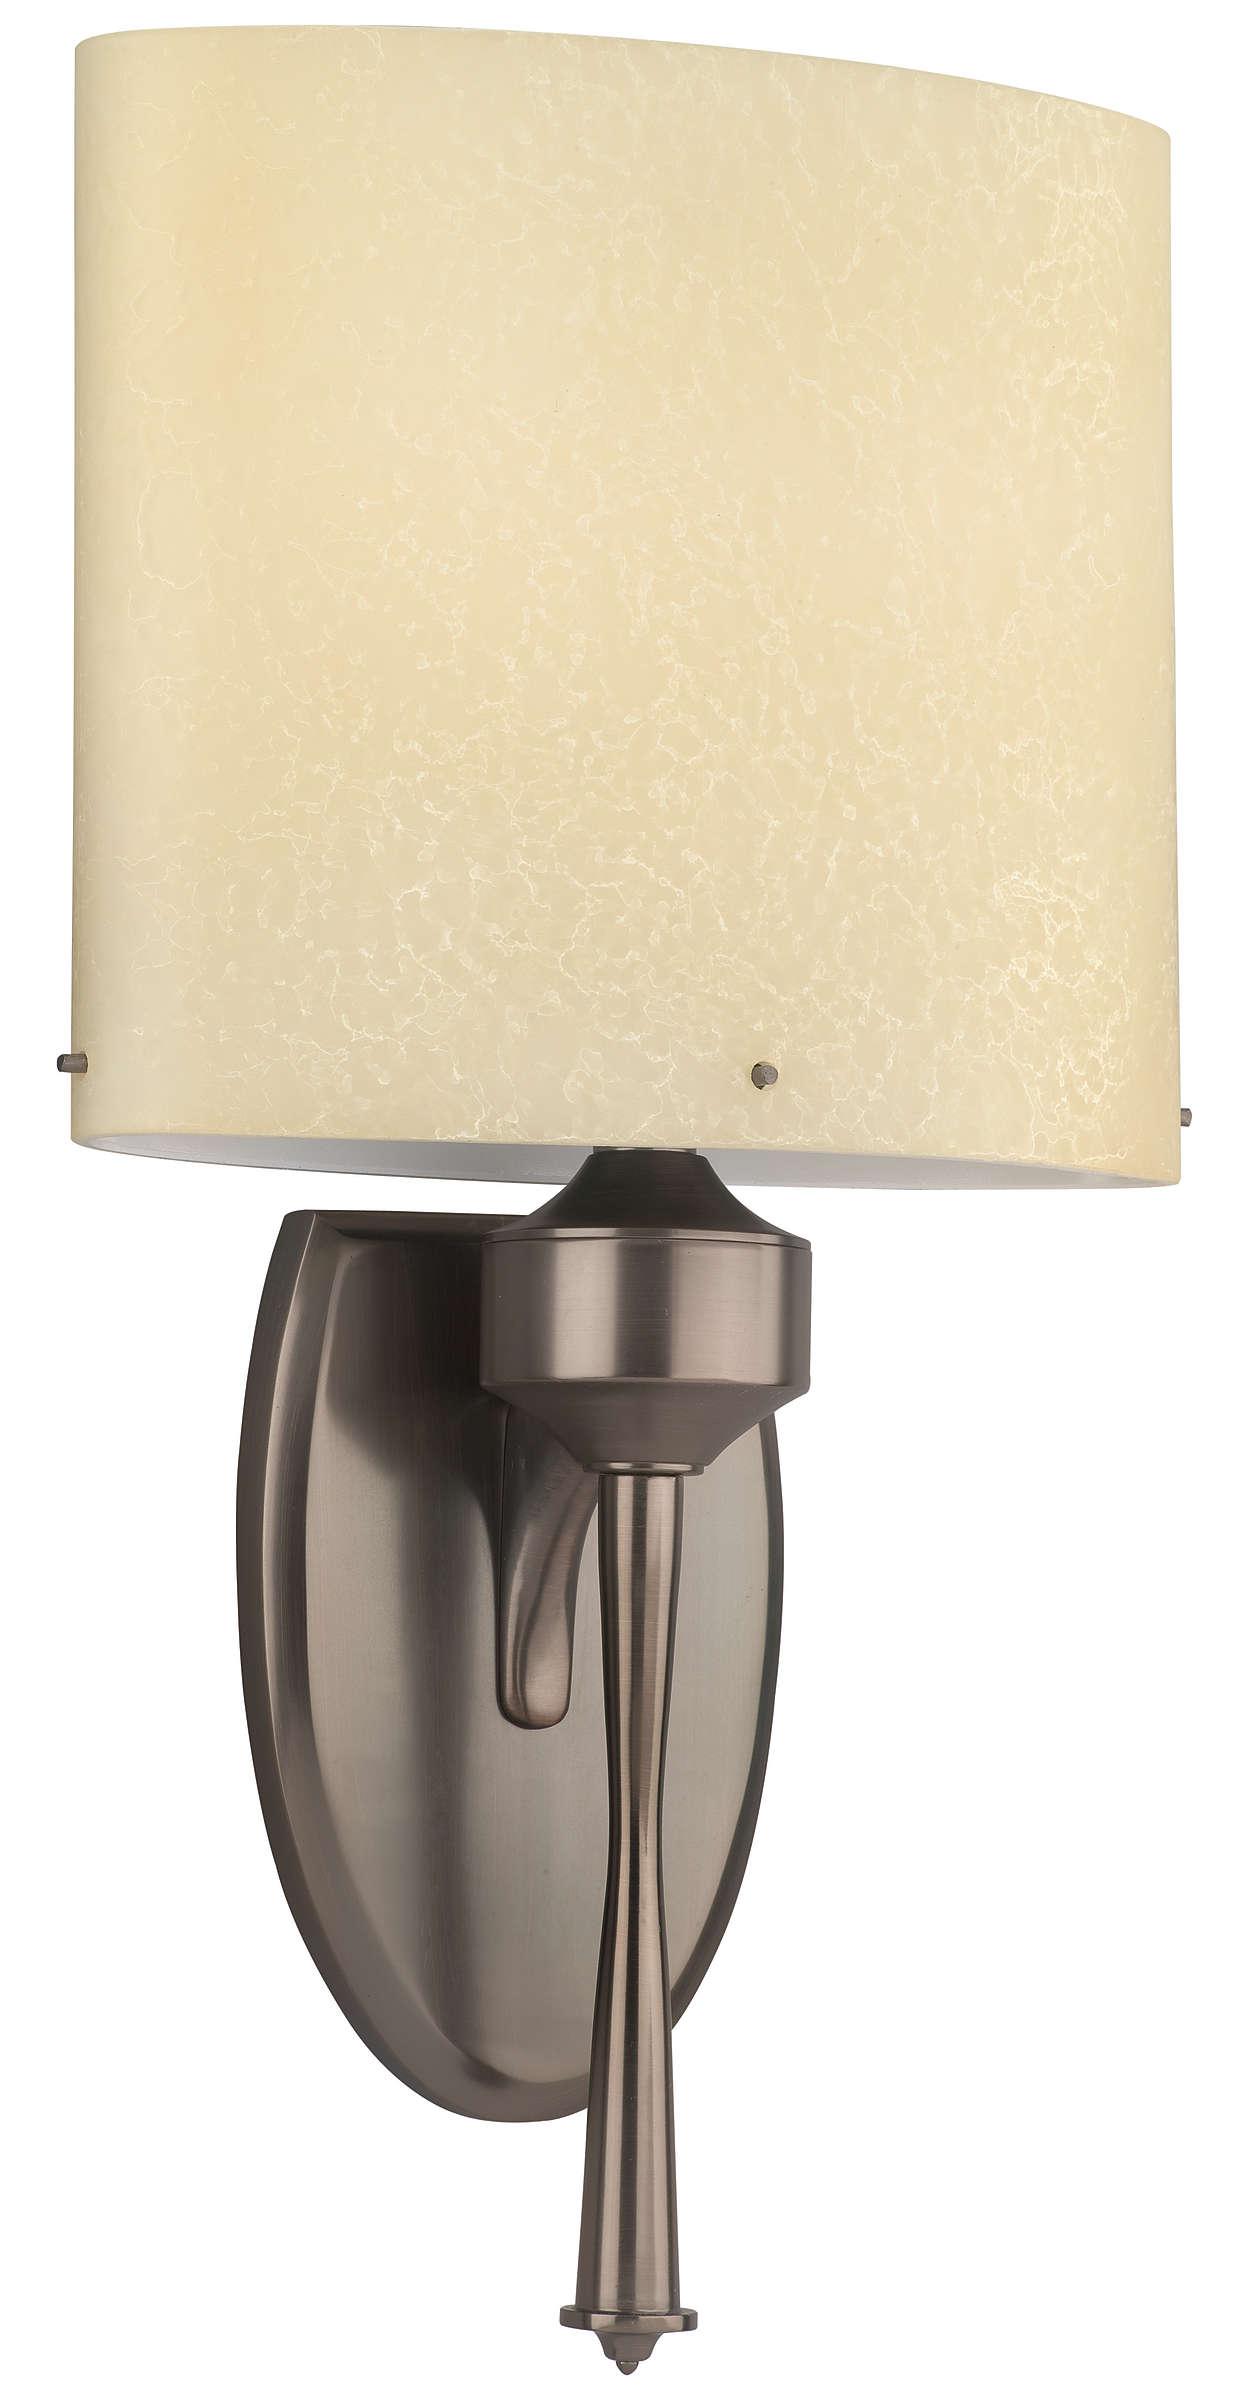 Tatem 2-light wall light